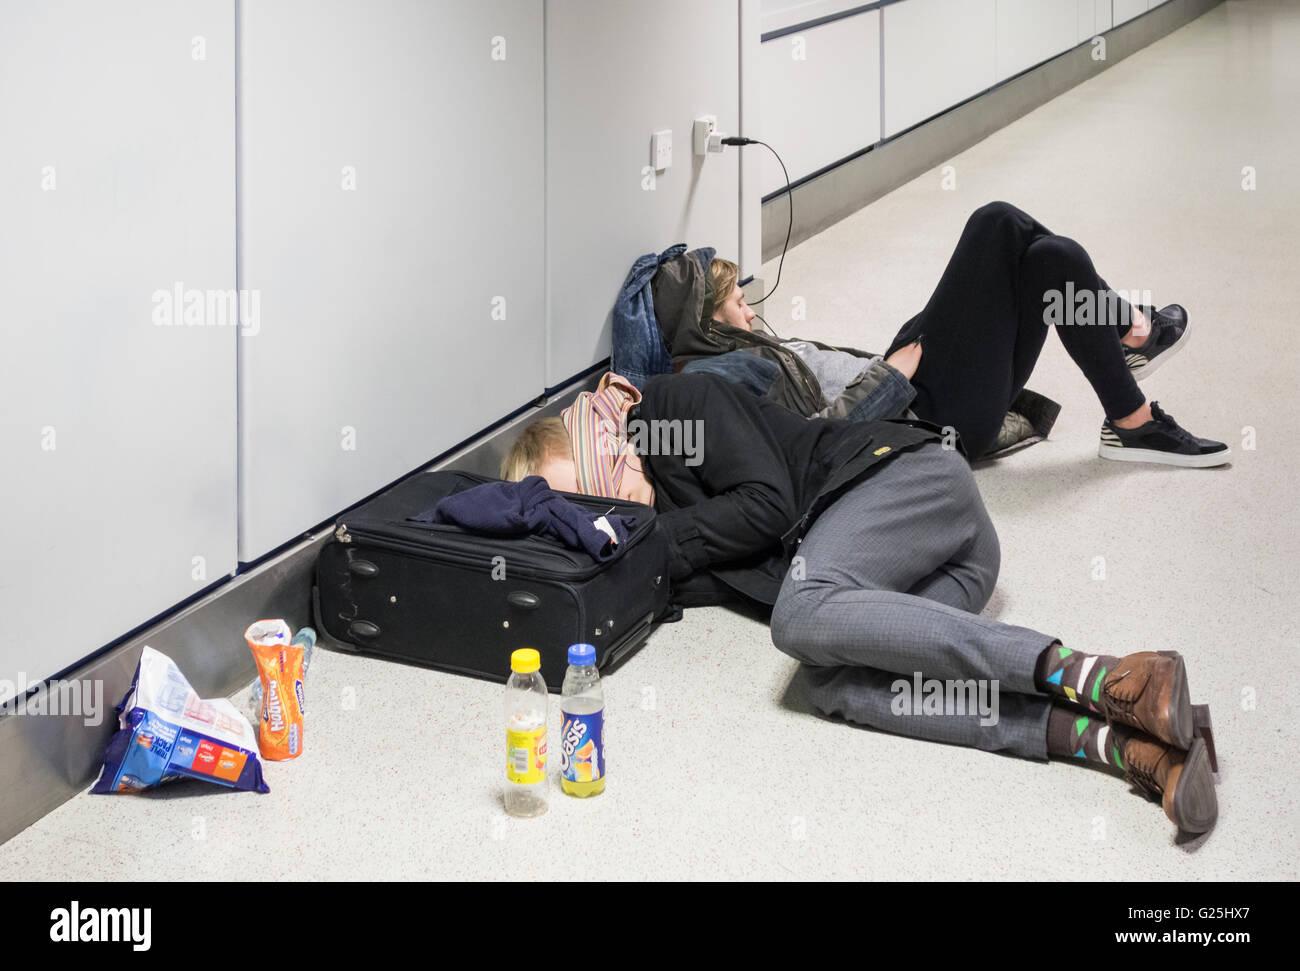 Two young men sleeping on airport terminal floor. UK - Stock Image